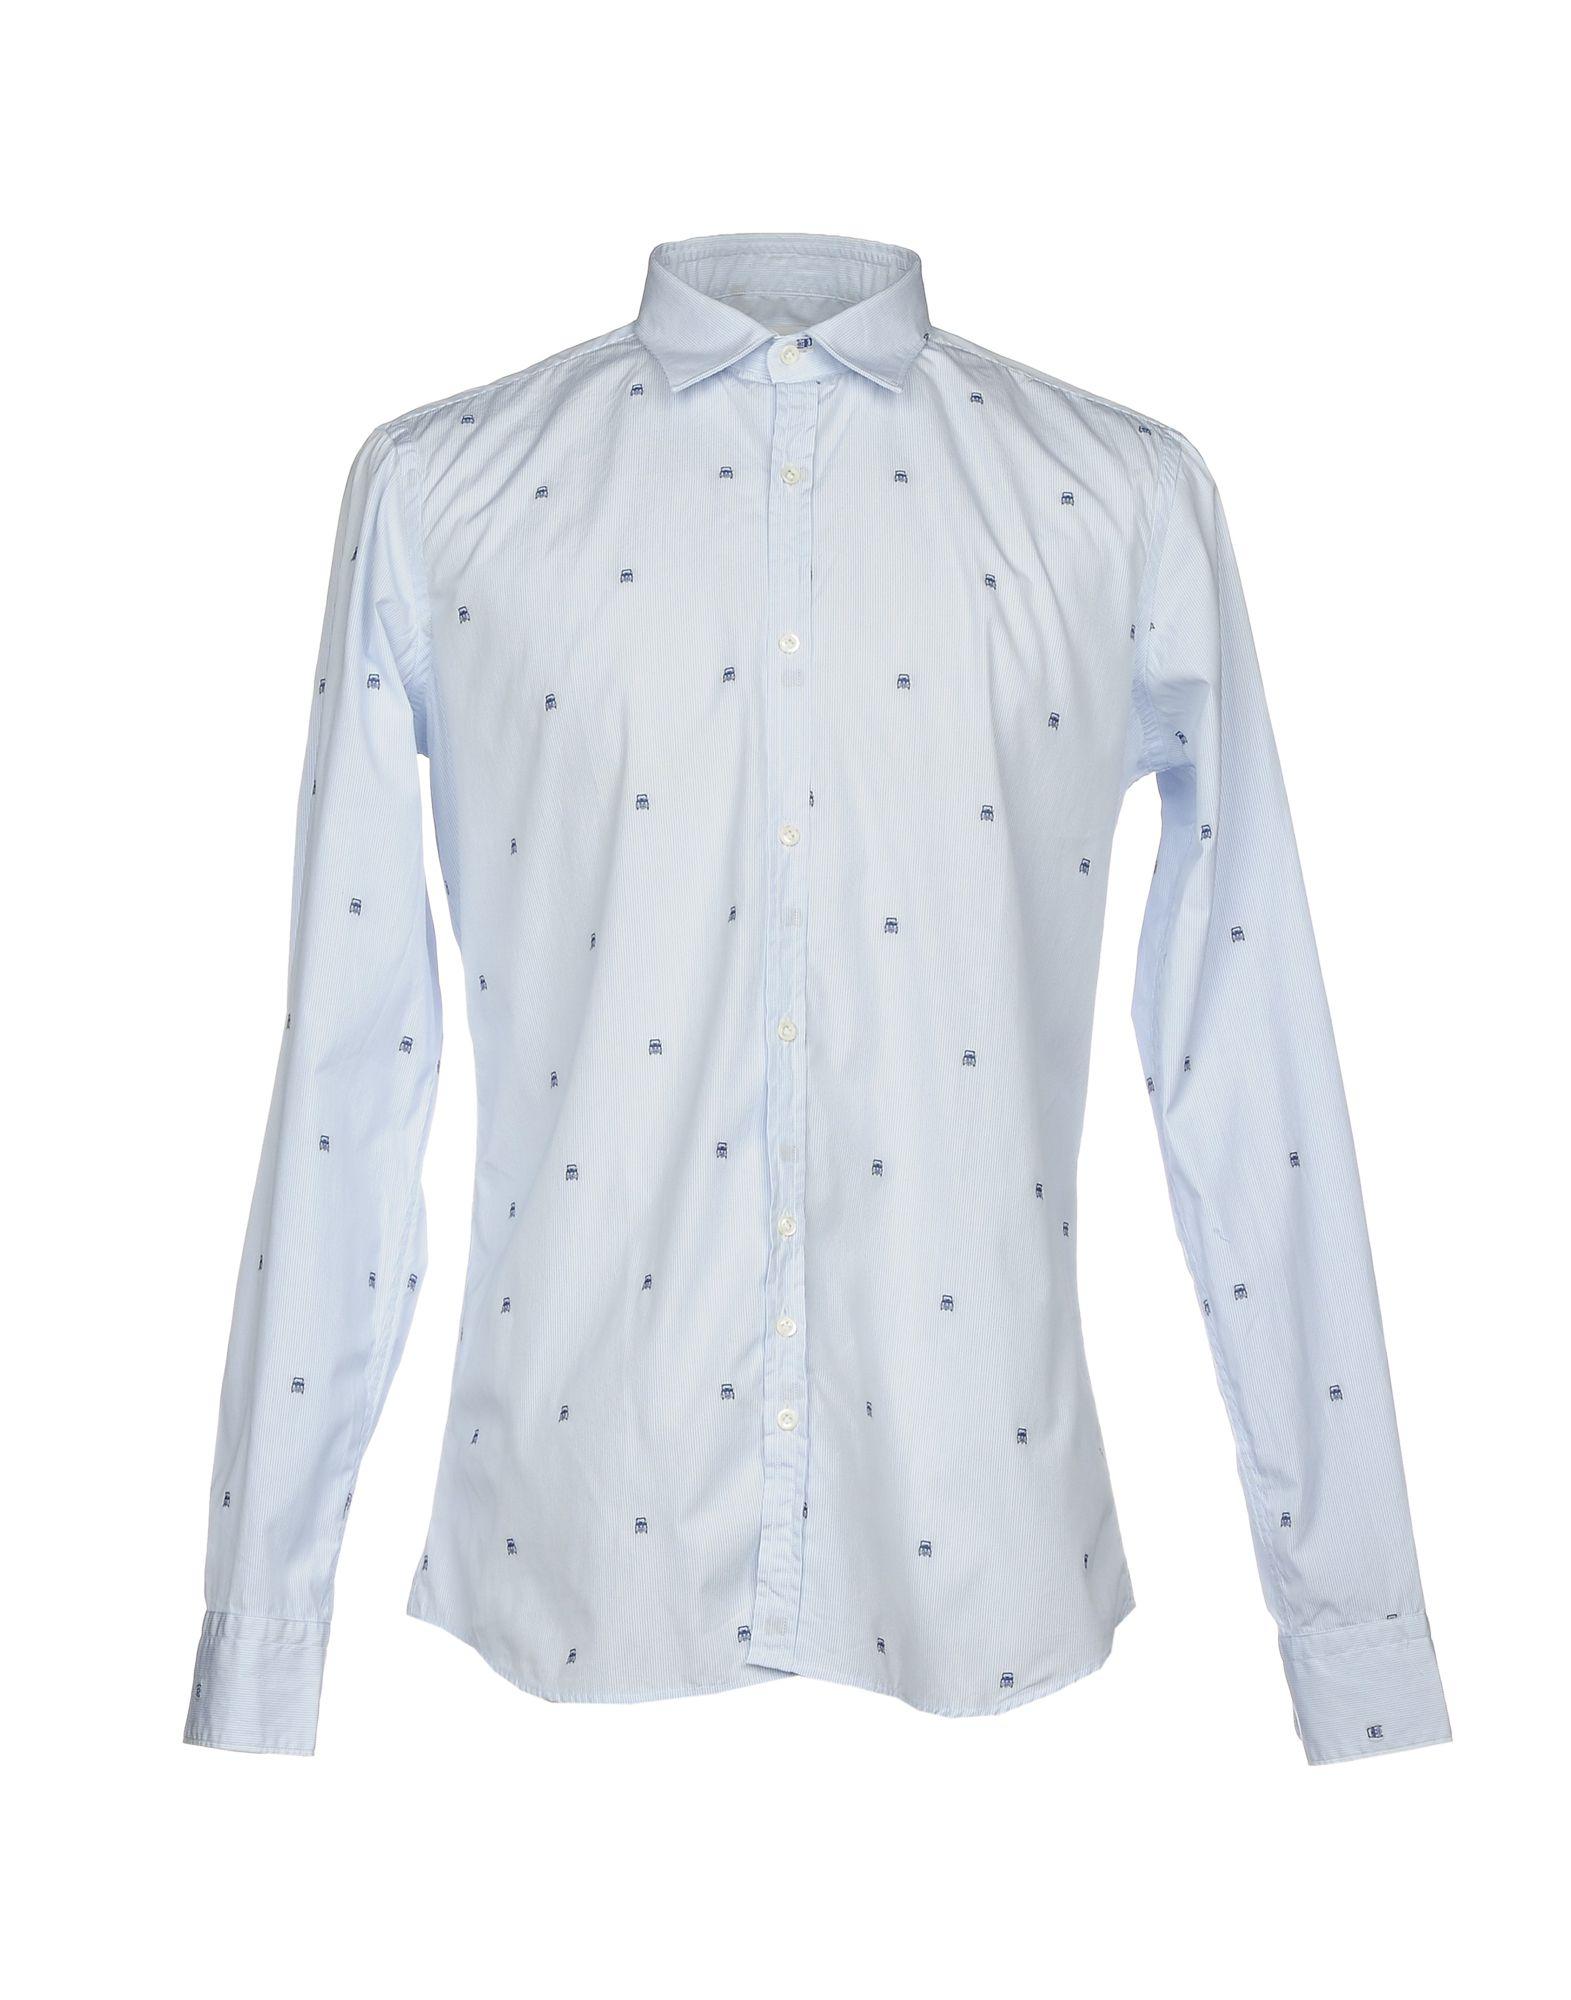 AGLINI Herren Hemd Farbe Himmelblau Größe 8